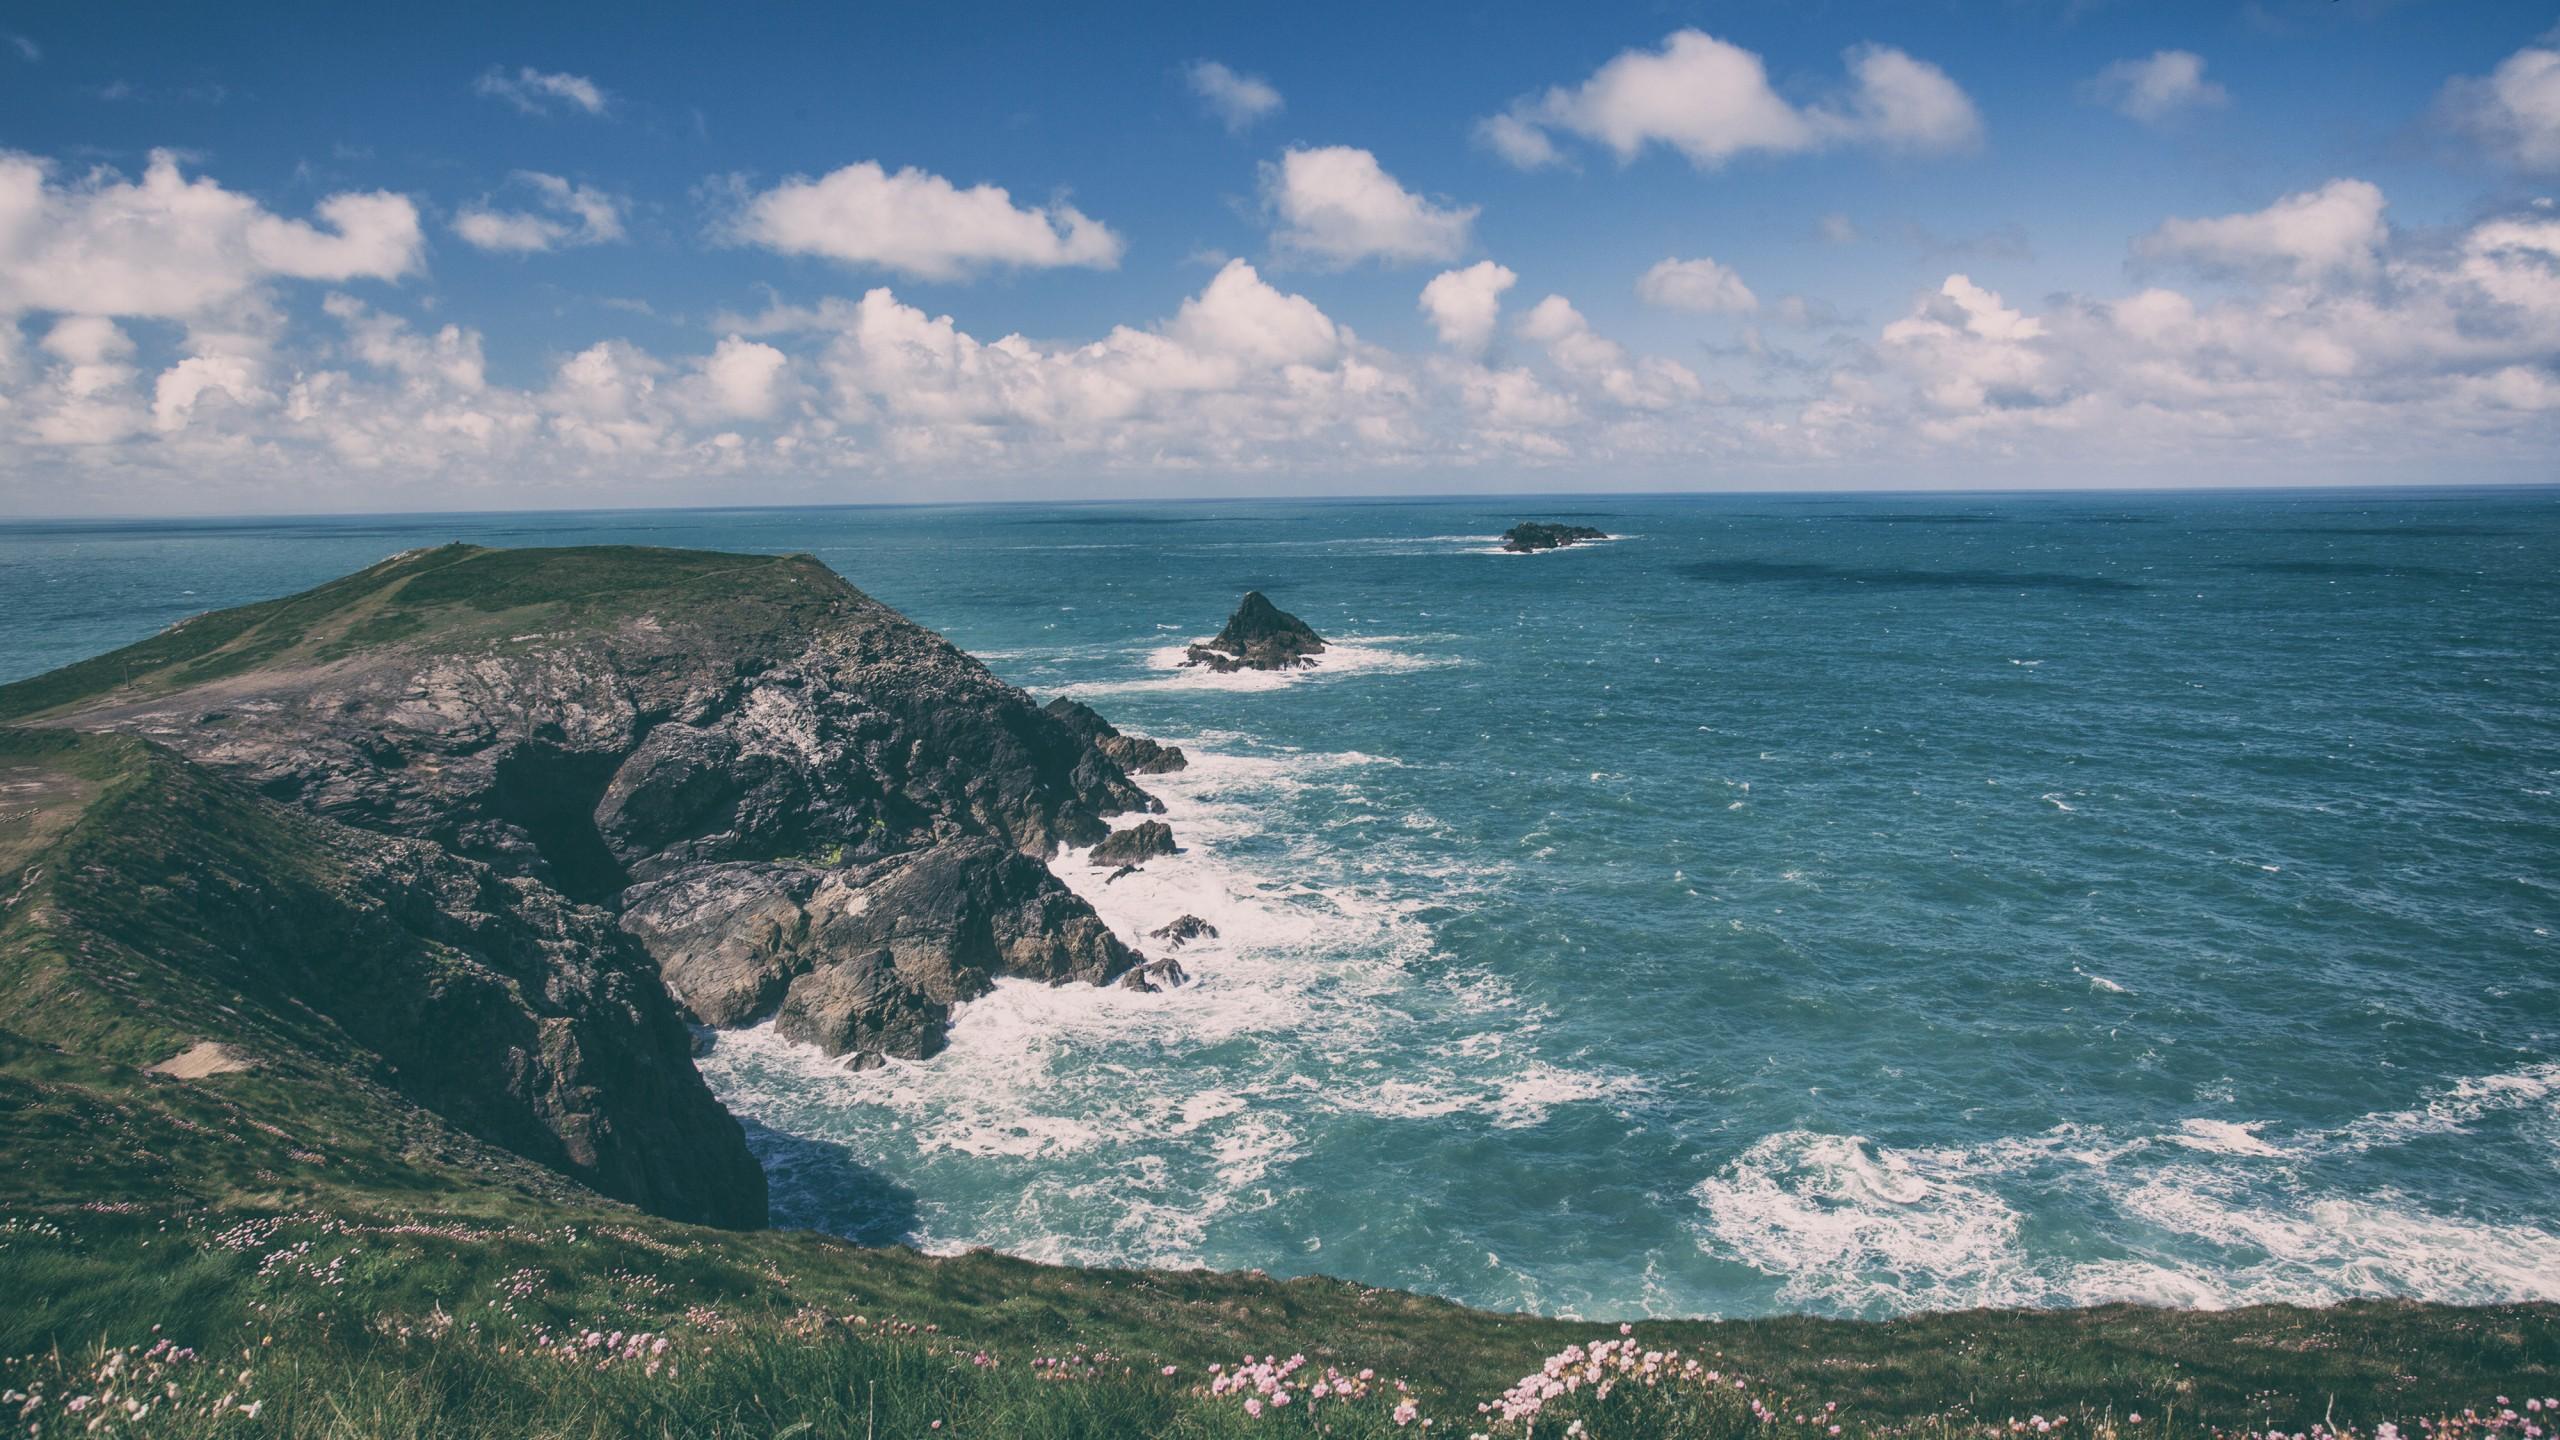 Wallpaper Cornwall 5k 4k wallpaper England coastline rocks 2560x1440